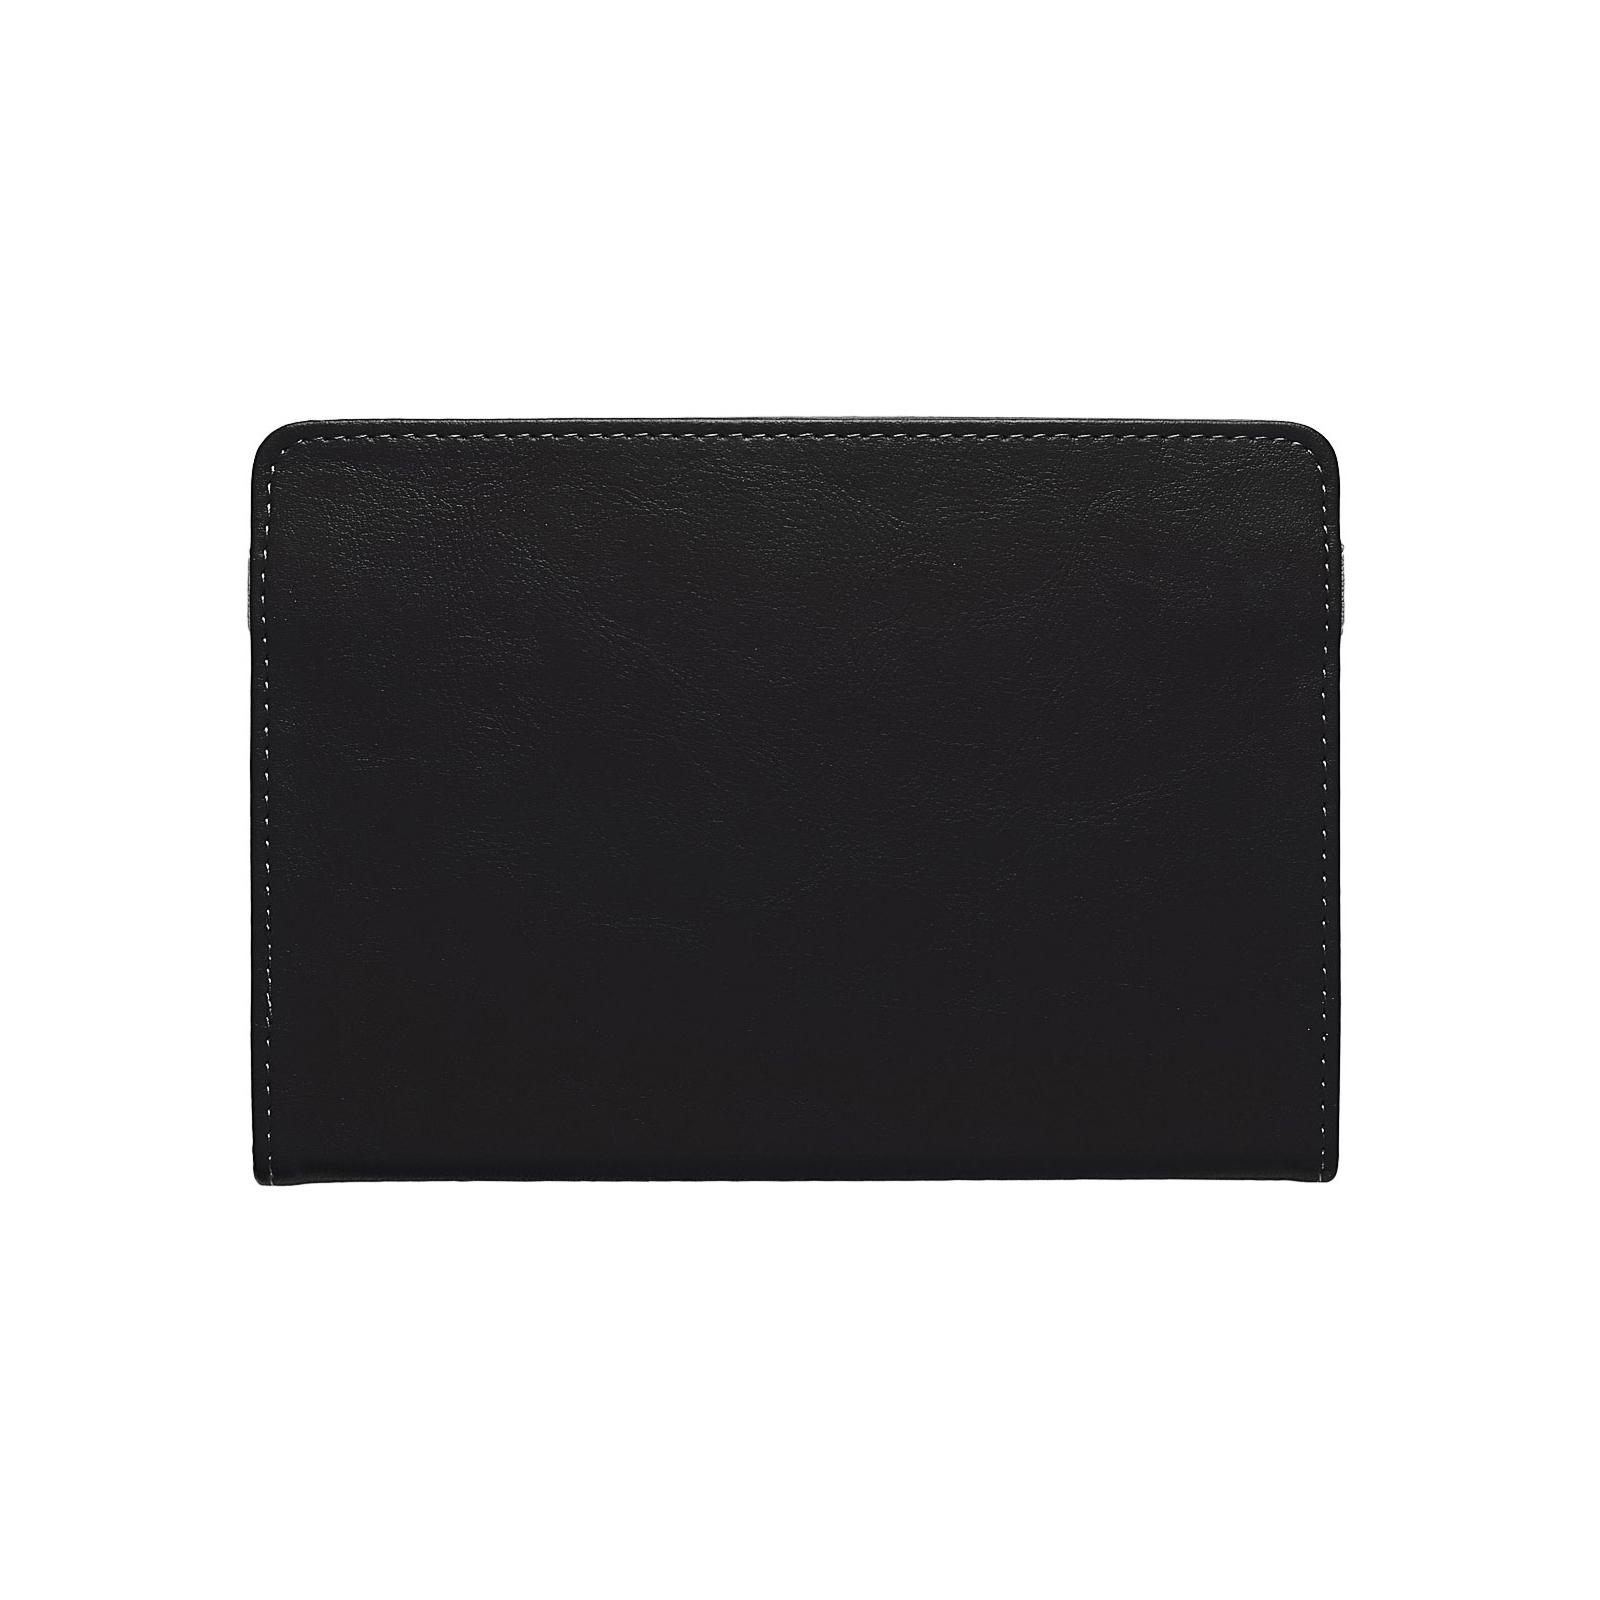 "Чехол для планшета Grand-X universal 7"" Grand-X TC04 Black (UTC - GX7TC04B)"